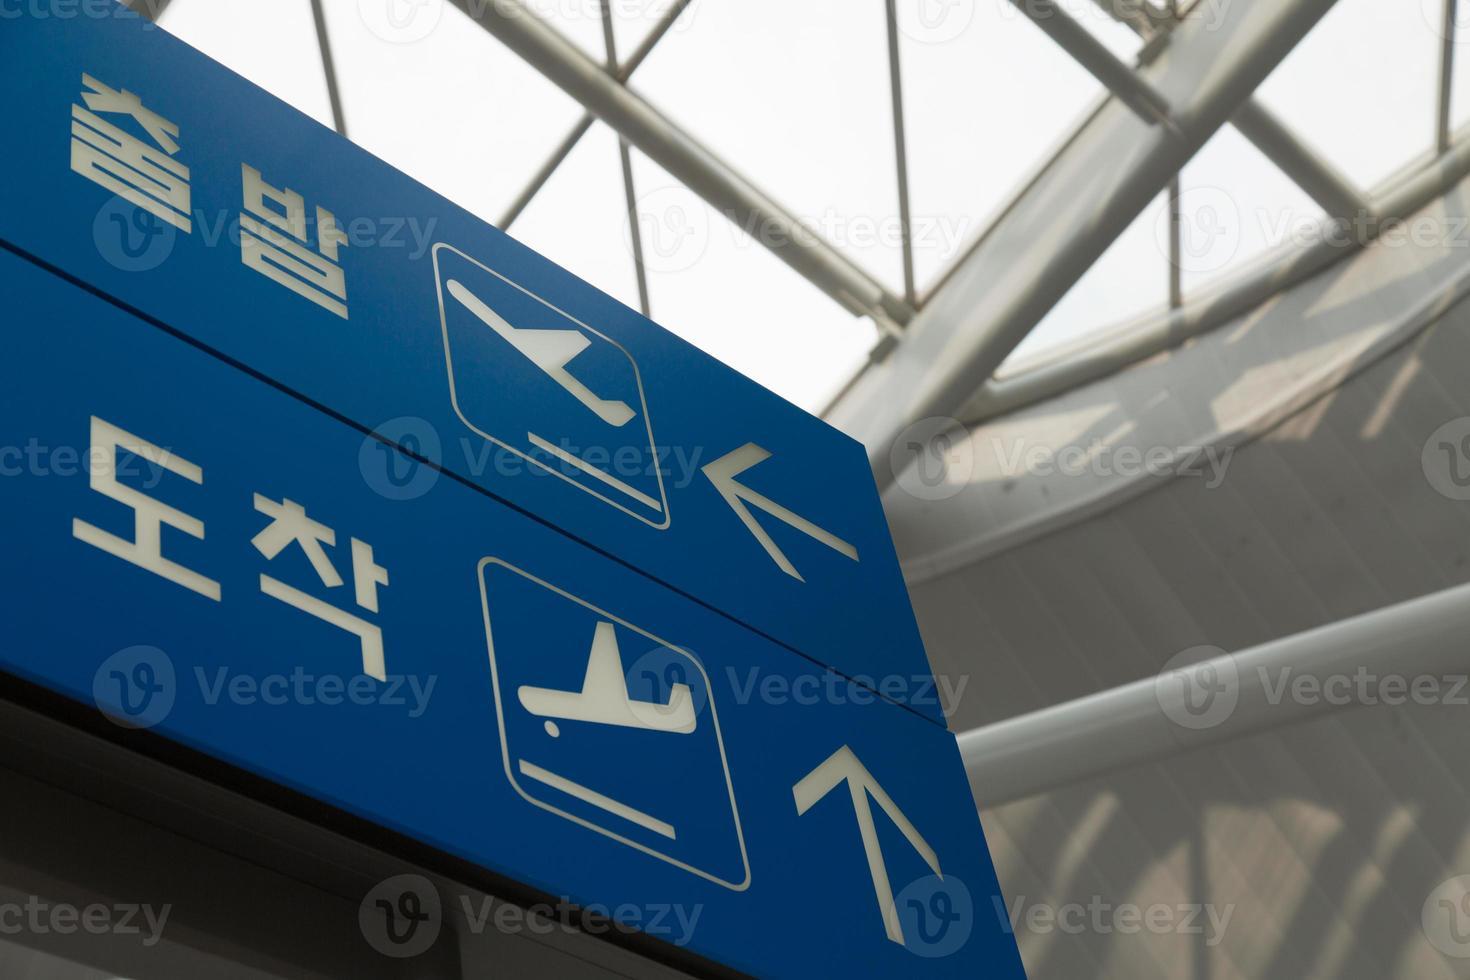 luchthaven terminal borden foto